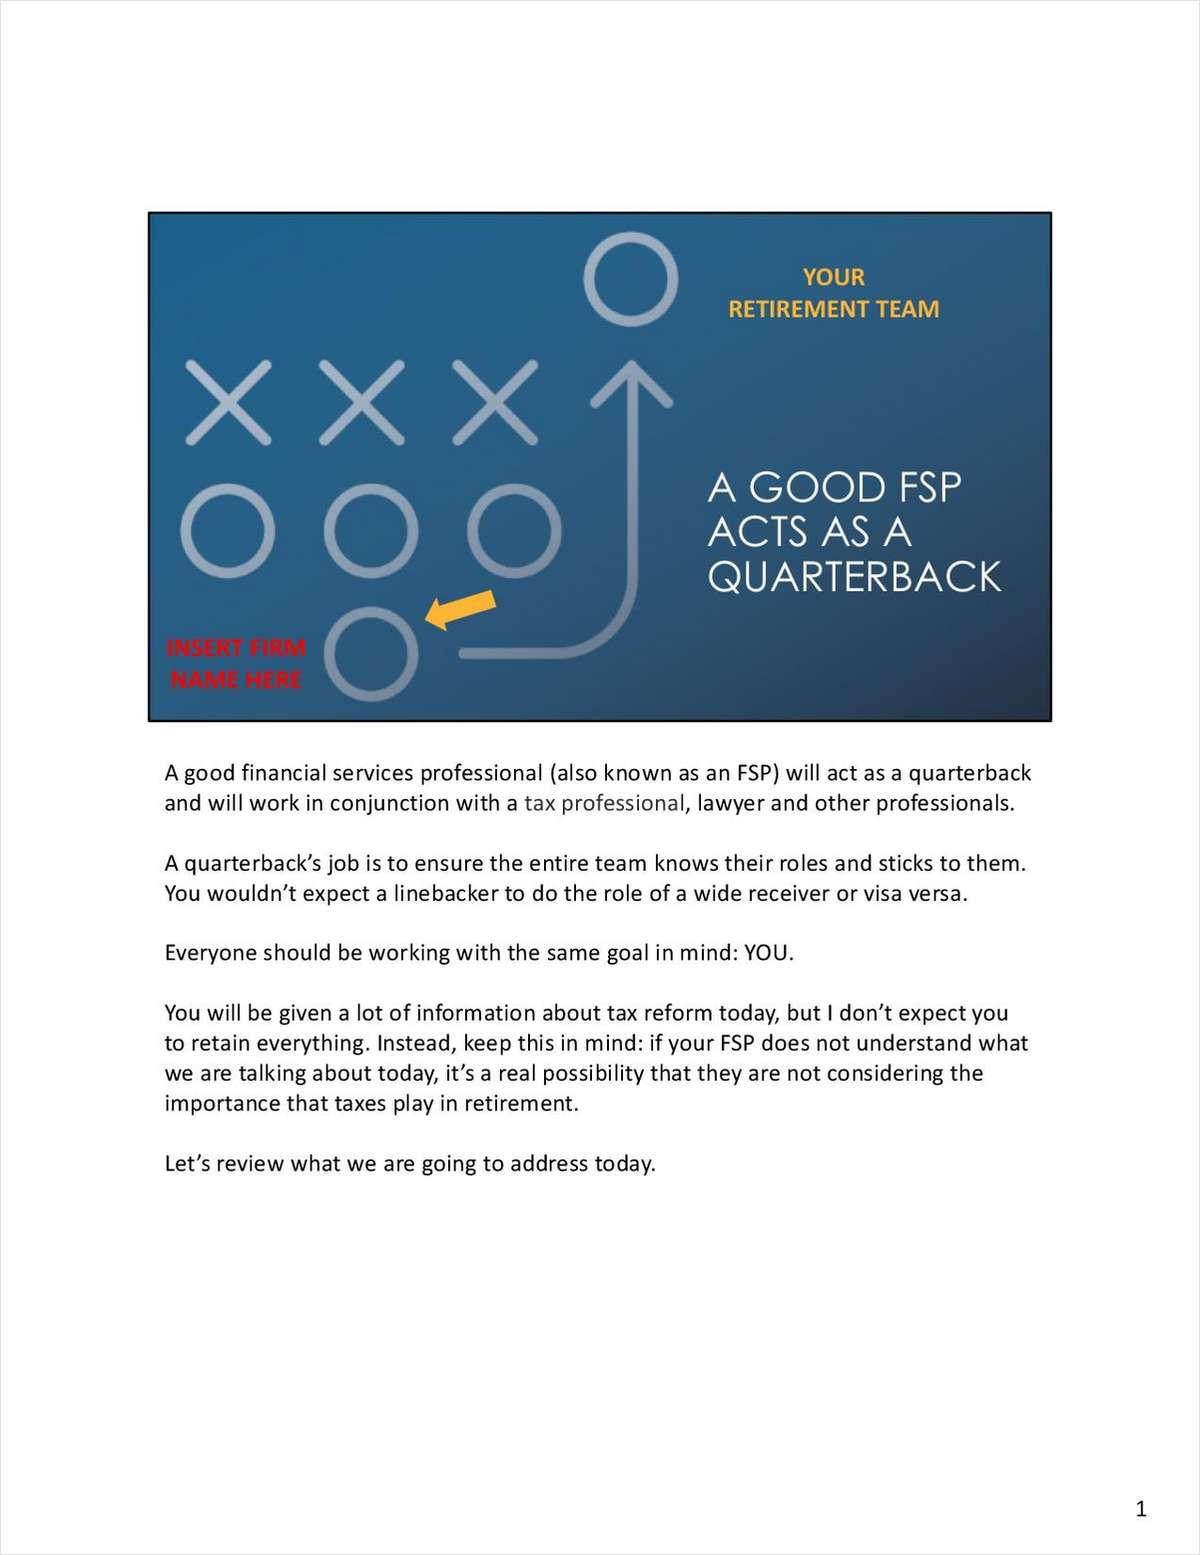 Advisor Presentation: A Good Financial Services Professional Acts As a Quarterback